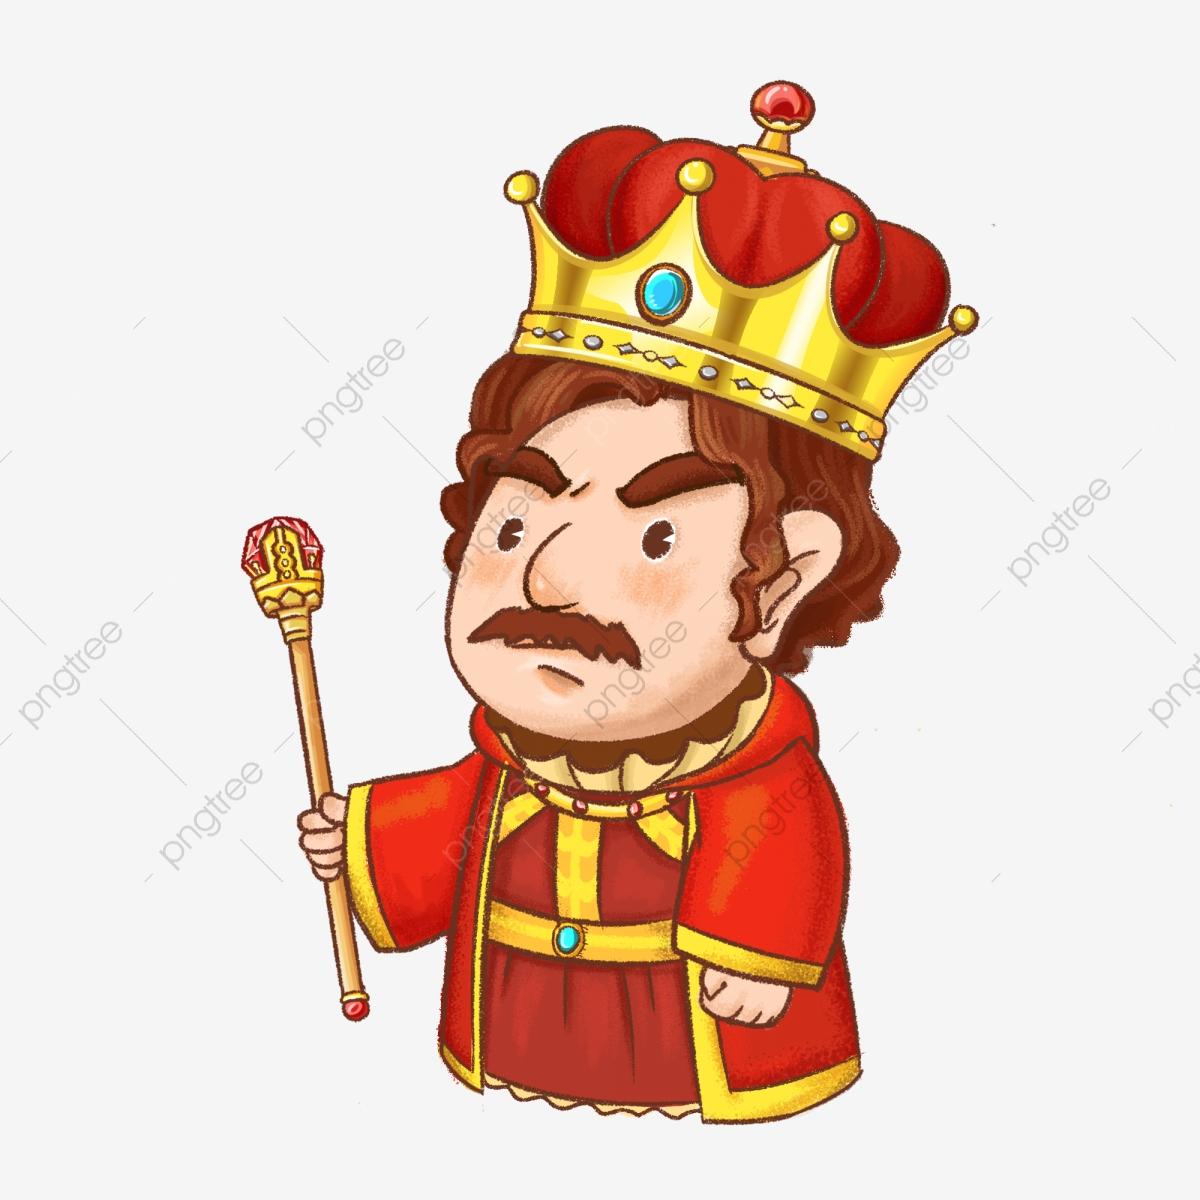 Western cartoon a scepter. King clipart holding